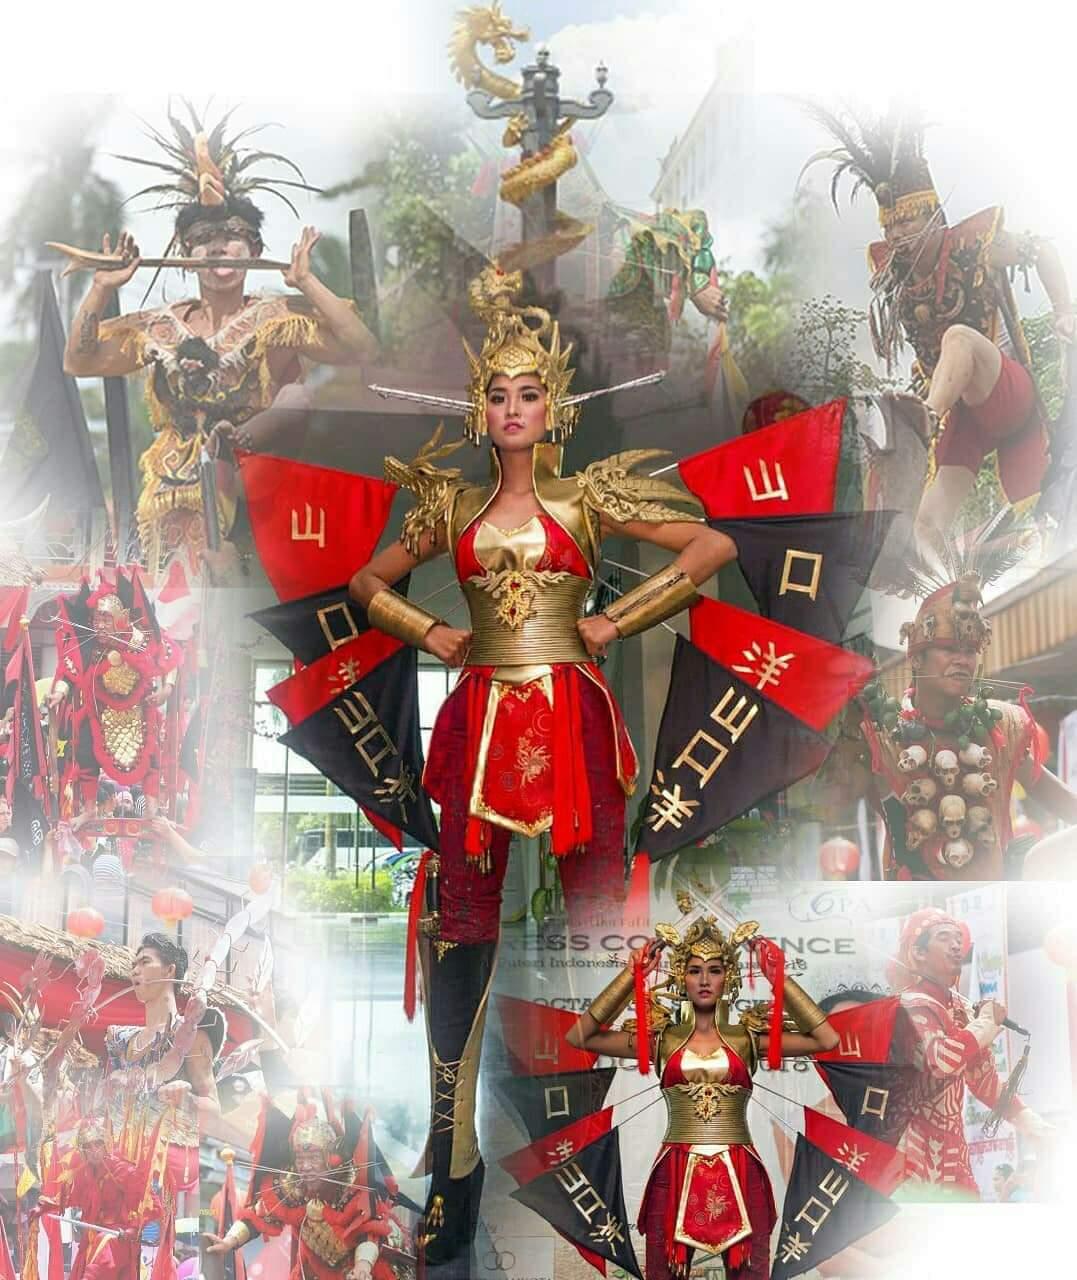 Wilda-Octaviana-Situngkir-Puteri-Indonesia-Pariwisata-2018-3rd-runner-up-Miss-Supranational-2018